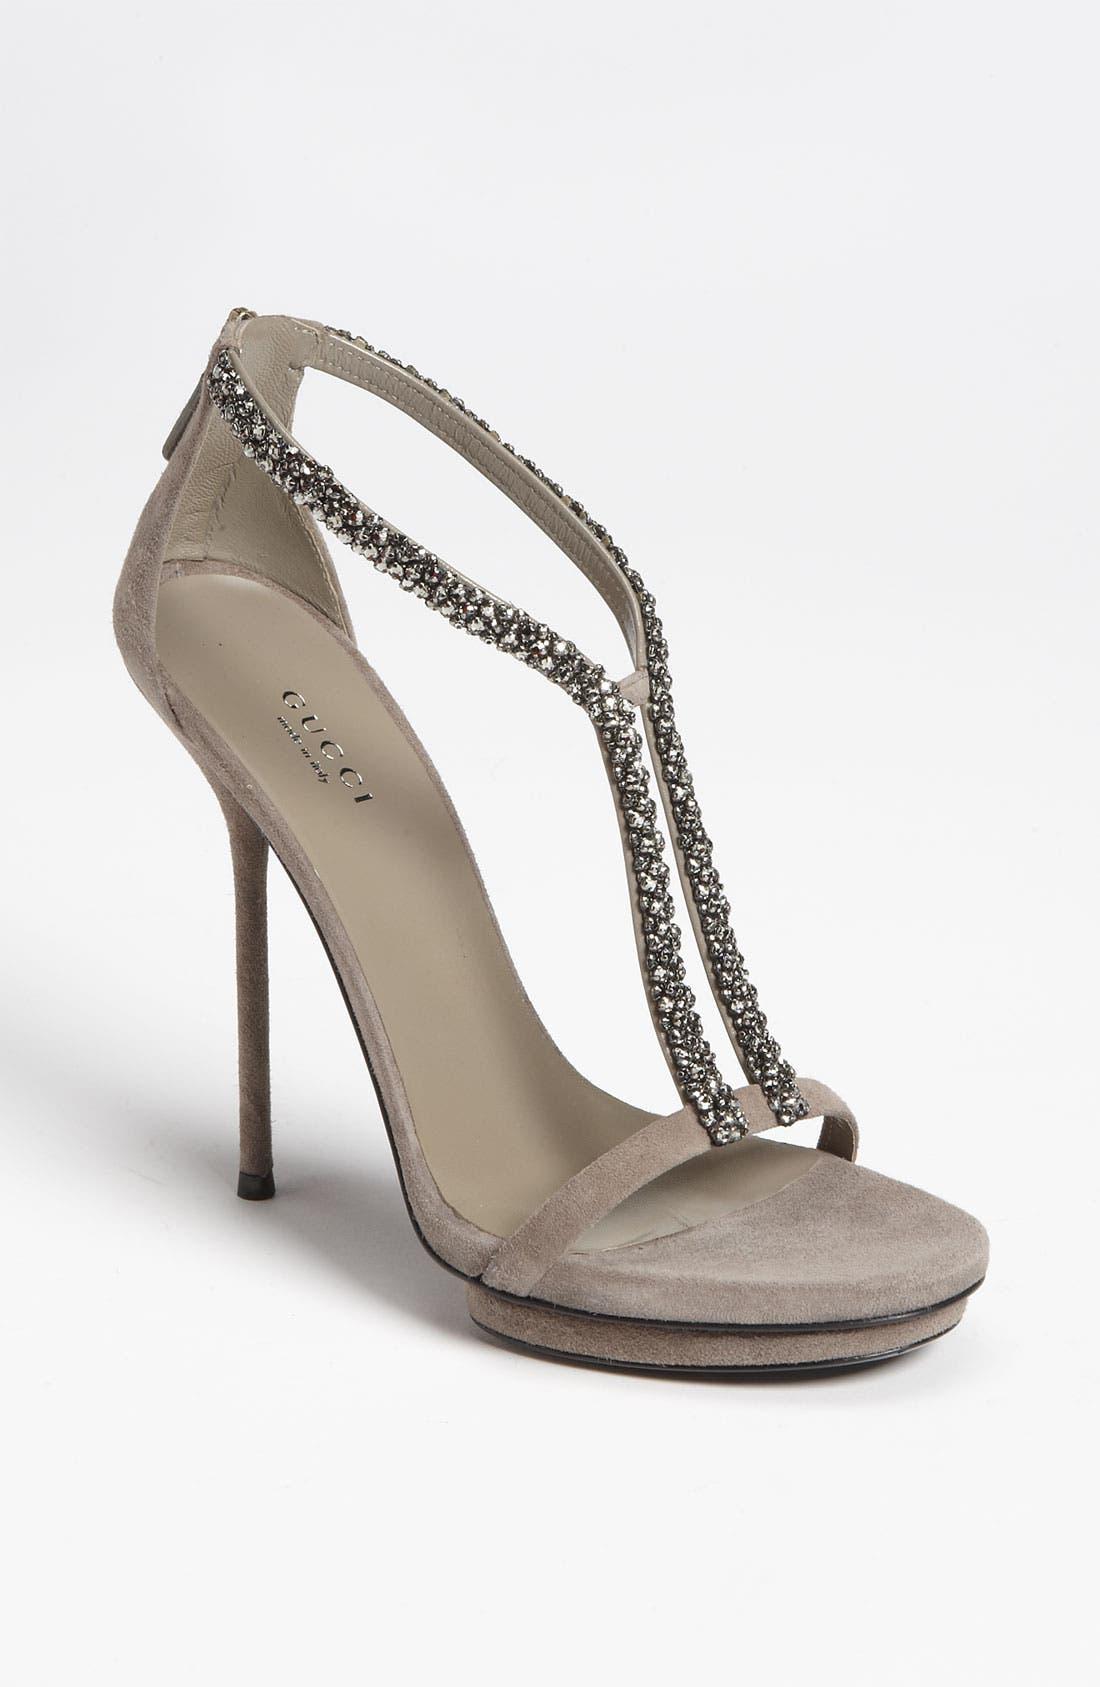 Main Image - Gucci 'Naomi' Sandal